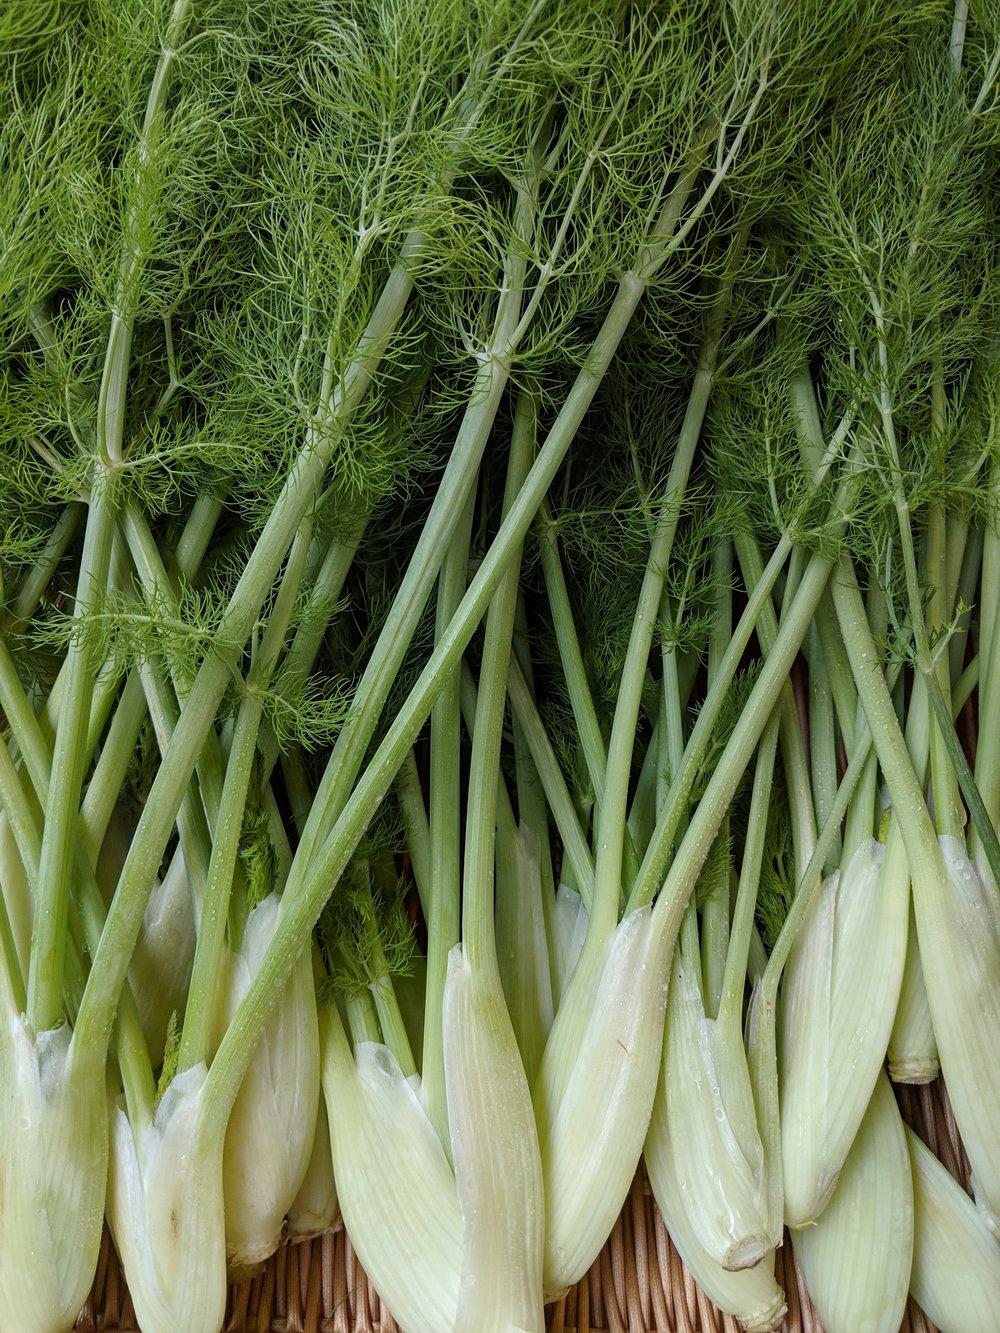 Market Shopping List - 4 bulbs fennel1 bunch radishes1 bunch daikon radish1 lb carrots2 lb mixed greens1 bu fresh mint1 bu fresh cilantro1 bag kale or collards or radish tops1 bag spinach2, 4 oz preferred cut of beef